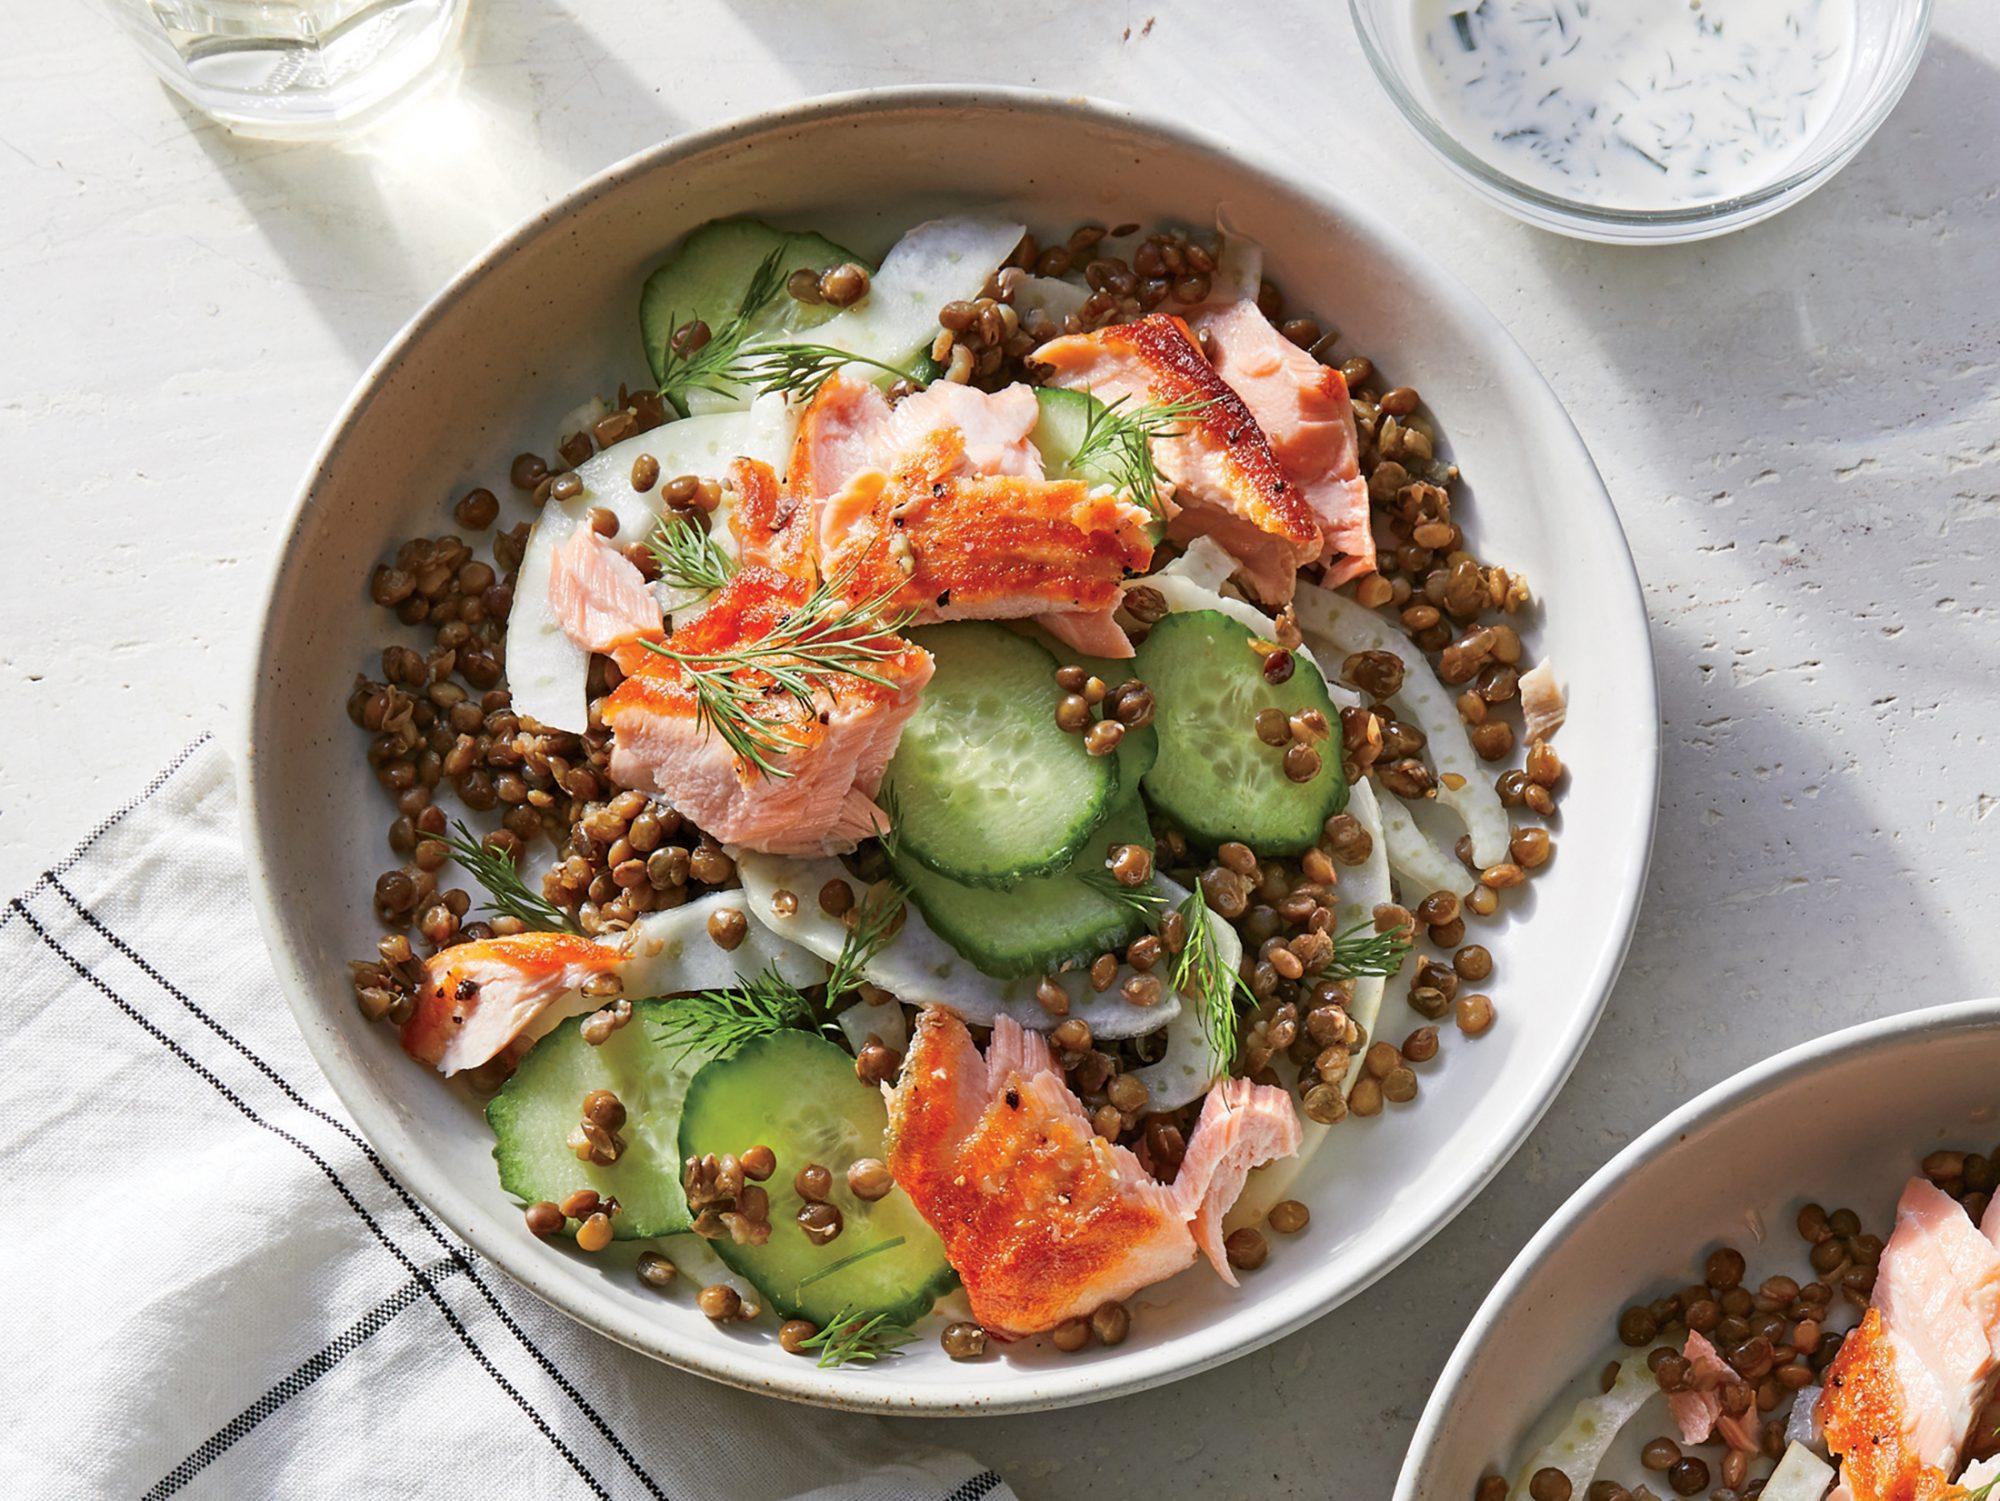 Salmon and Lentil Bowl with Kefir Dressing